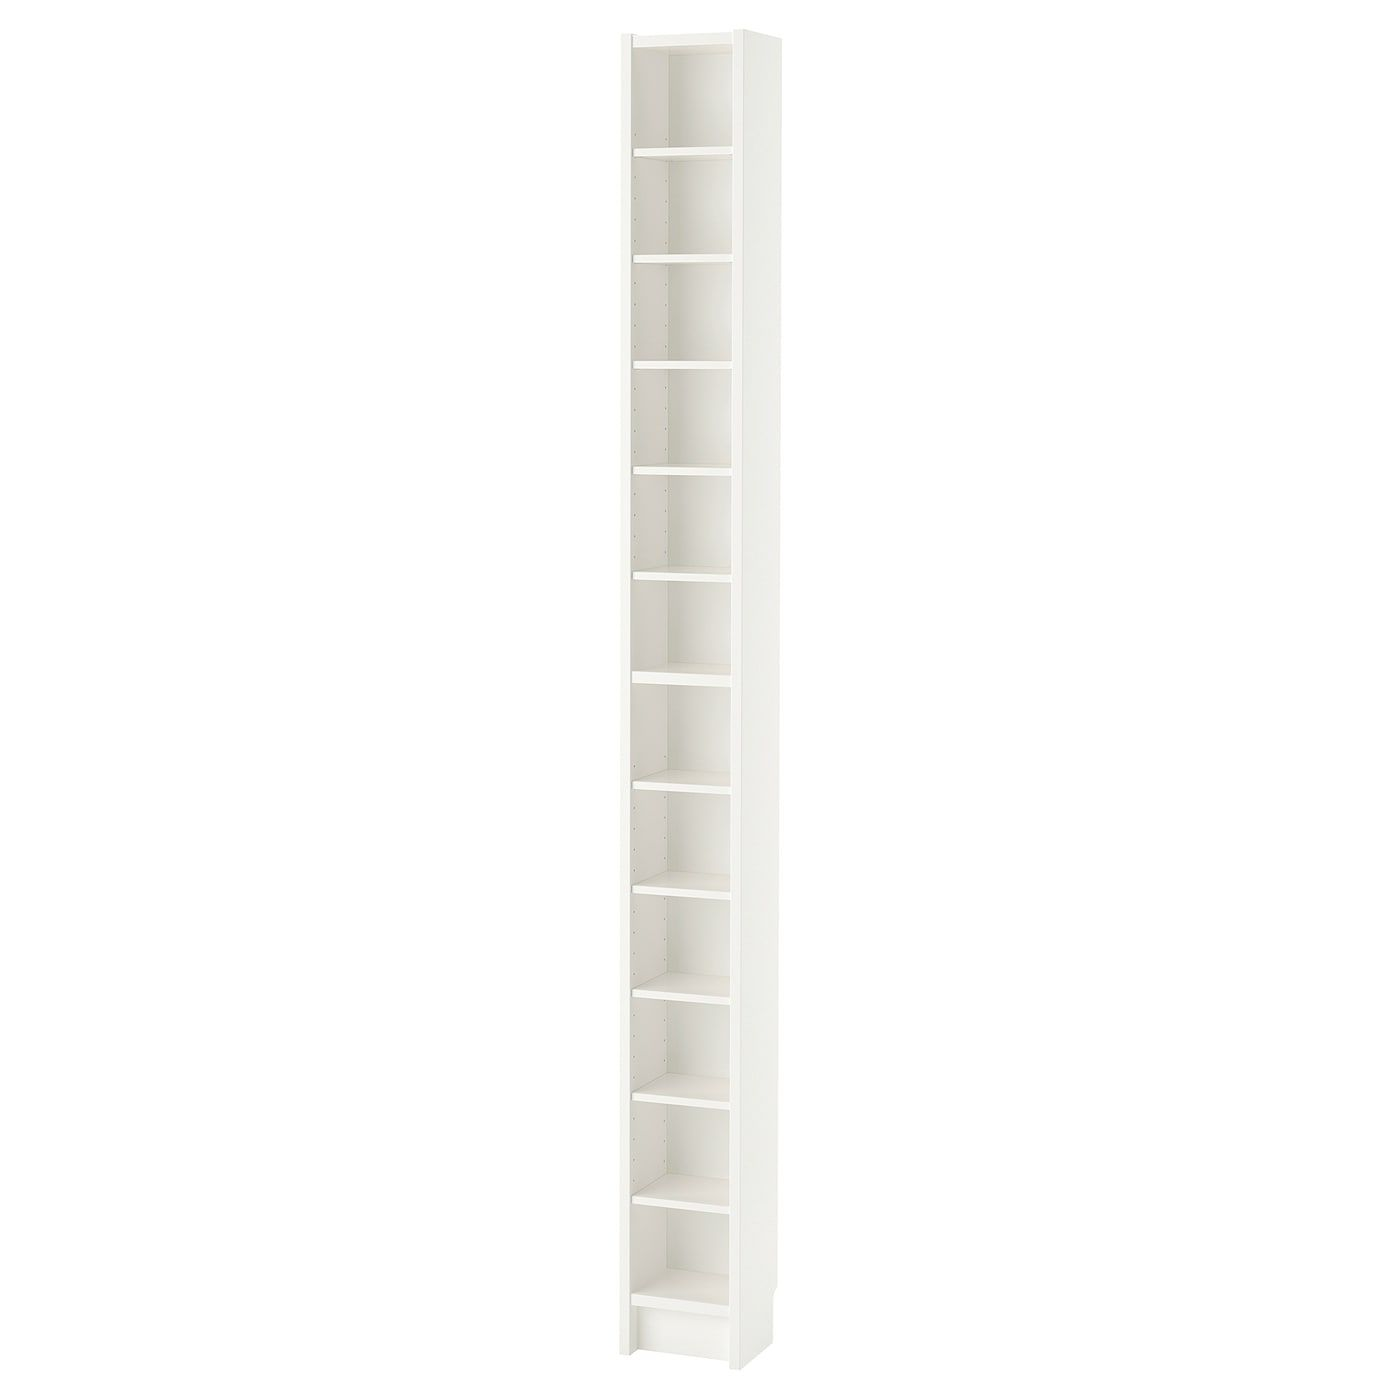 Gnedby Shelf Unit White 80 Wall Shelf Unit Billy Bookcase